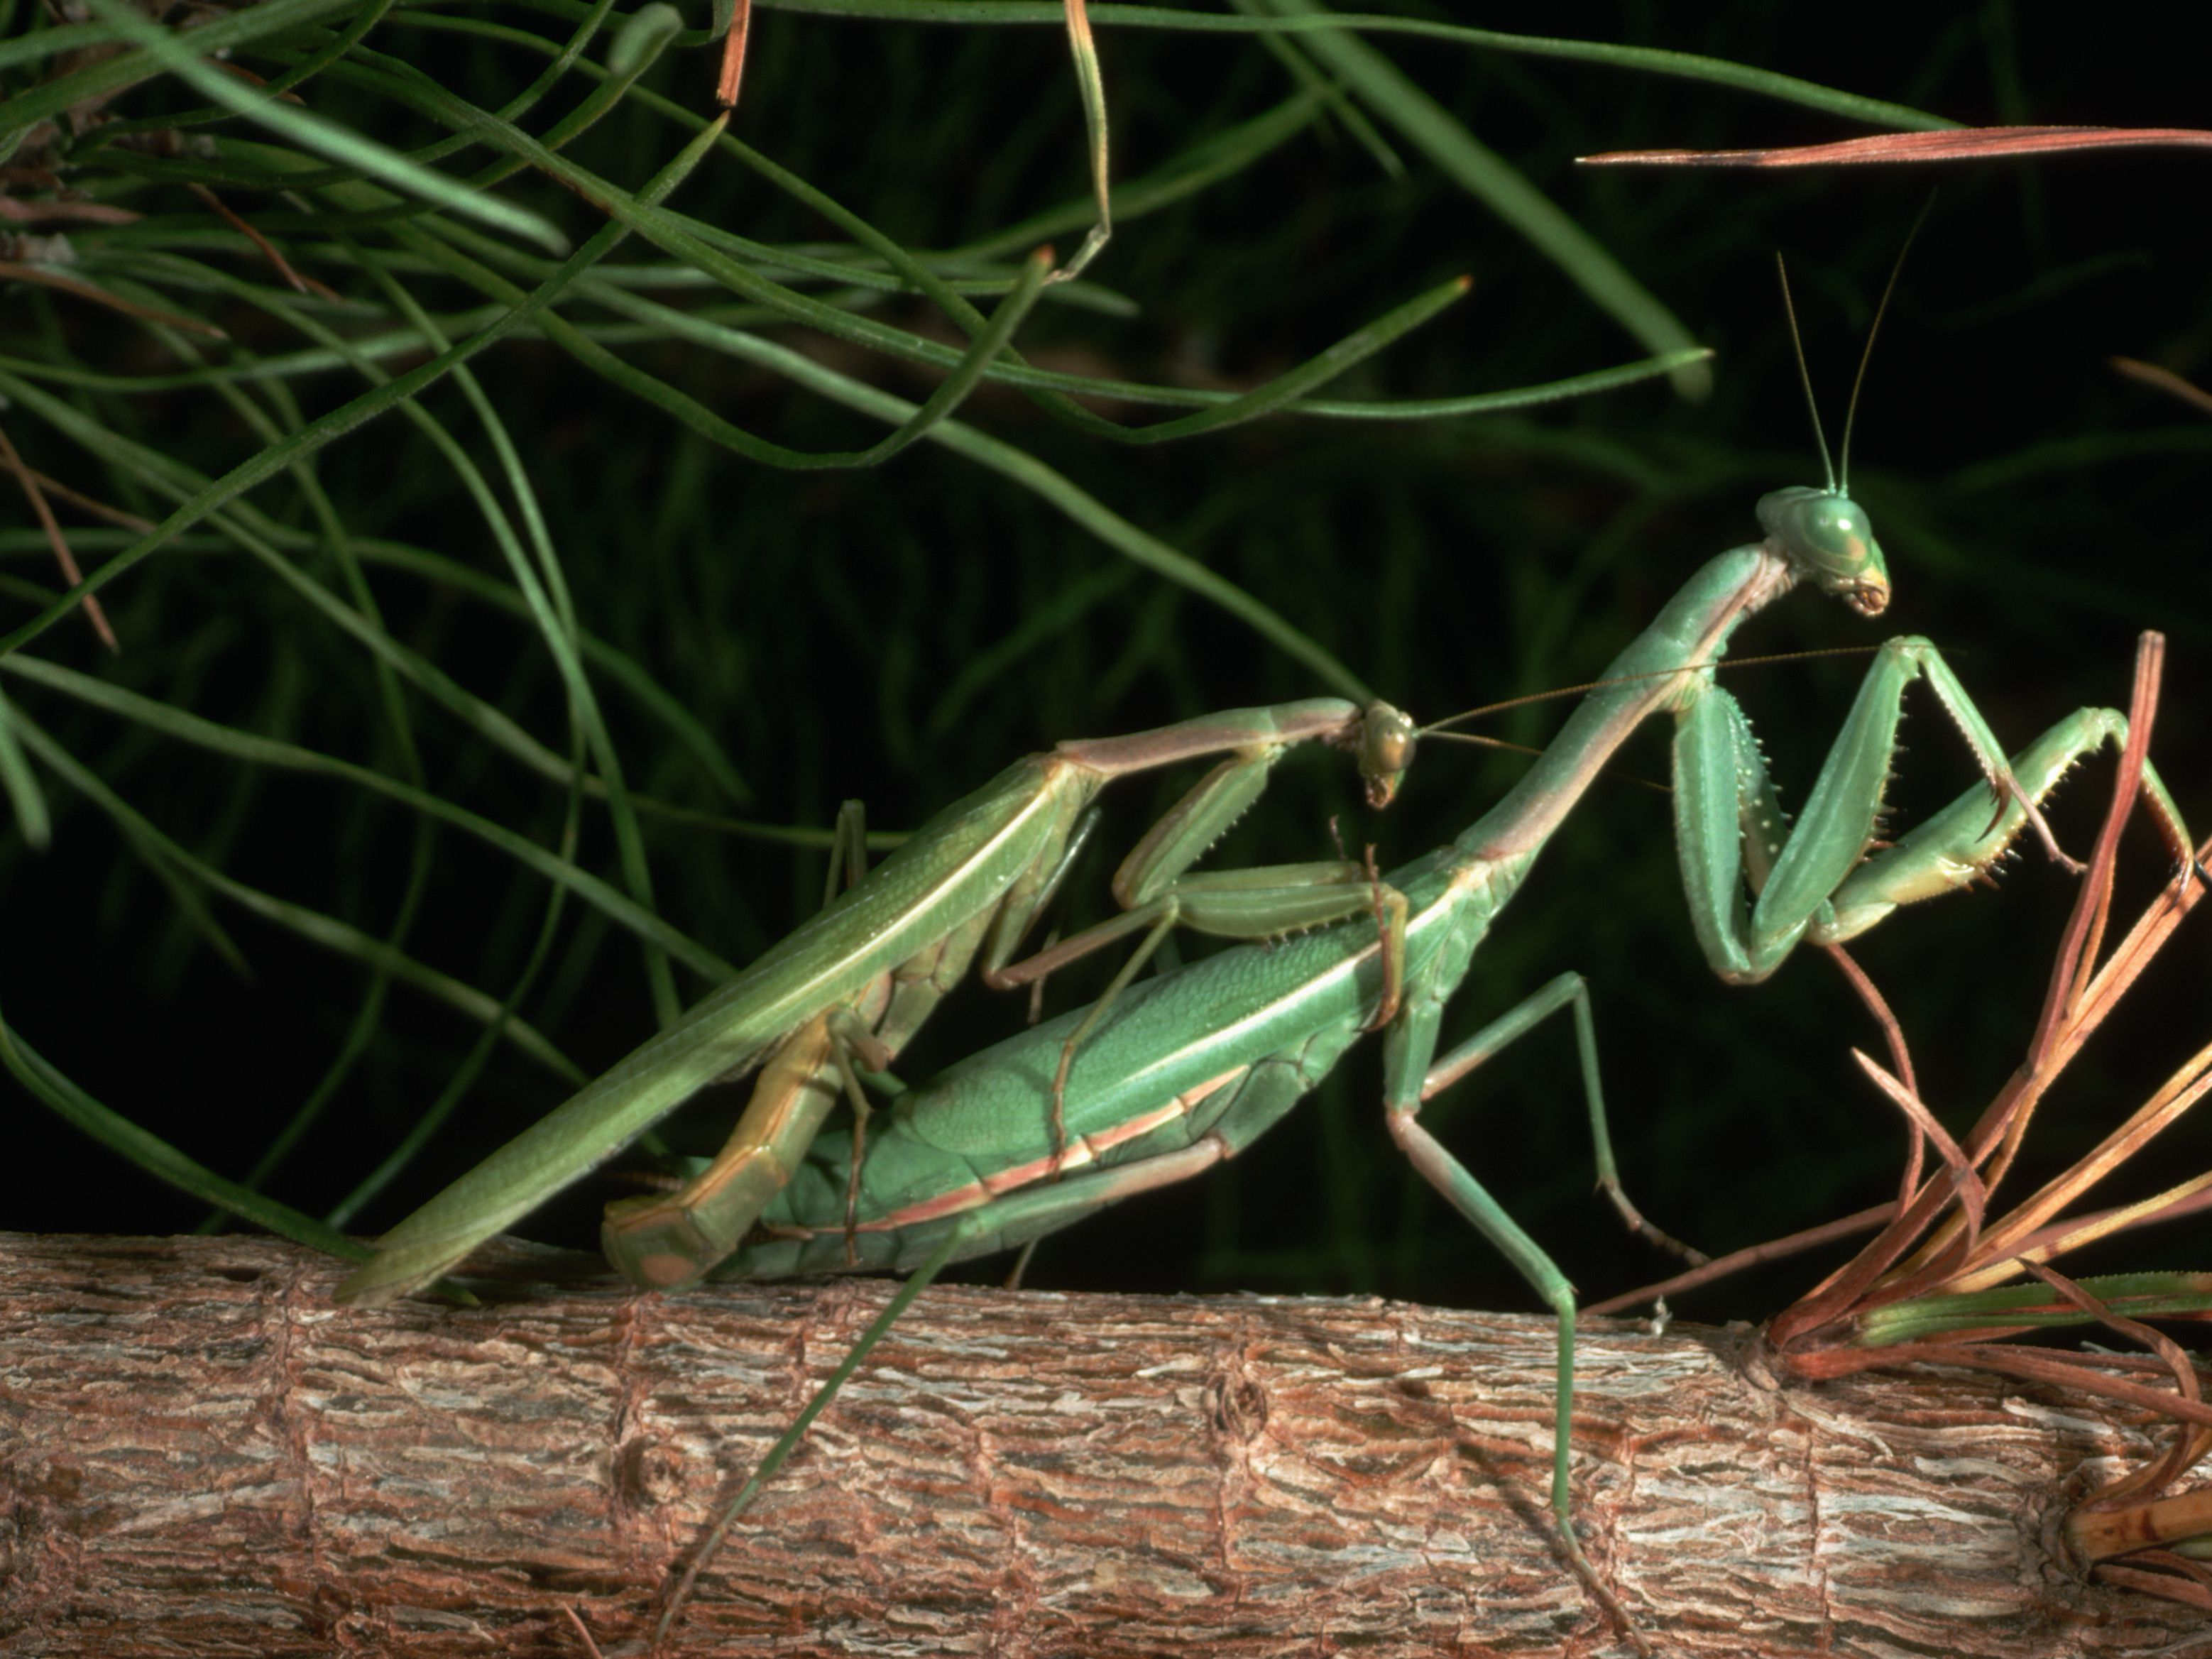 Praying Mantis Mating And Cannibalism